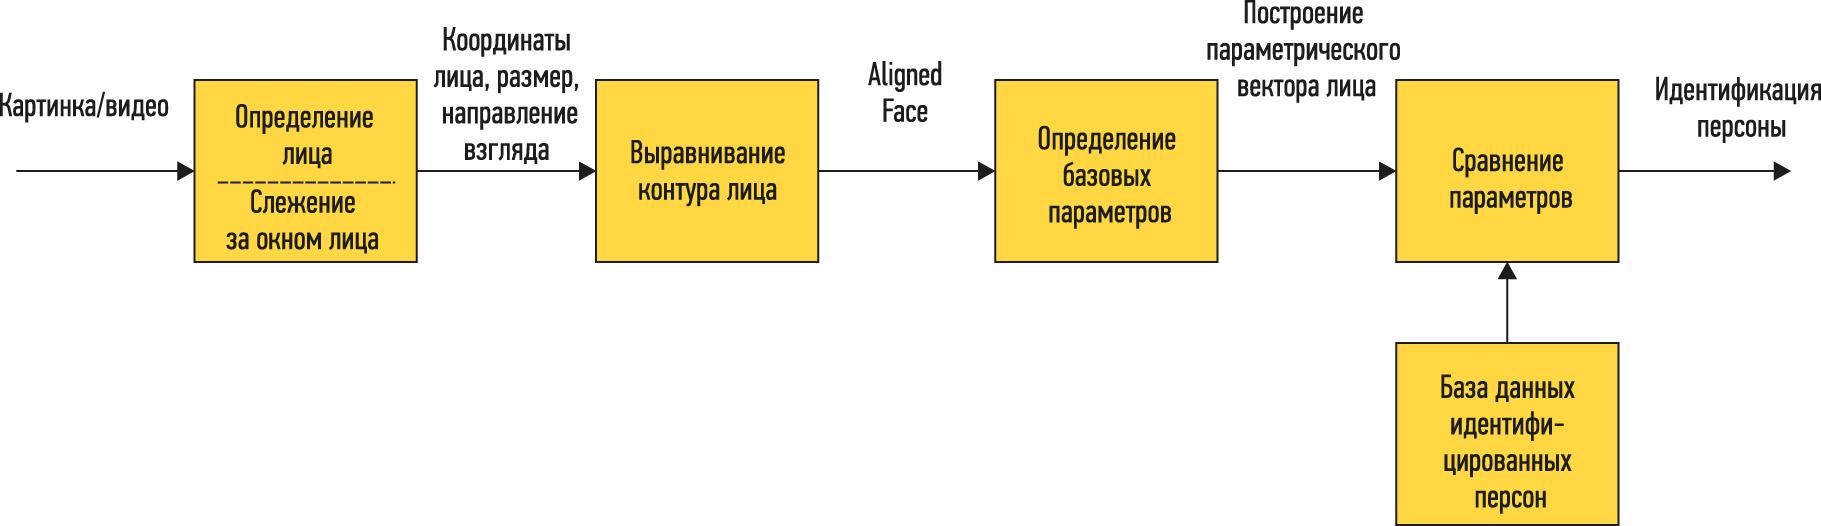 Алгоритм распознавания лиц